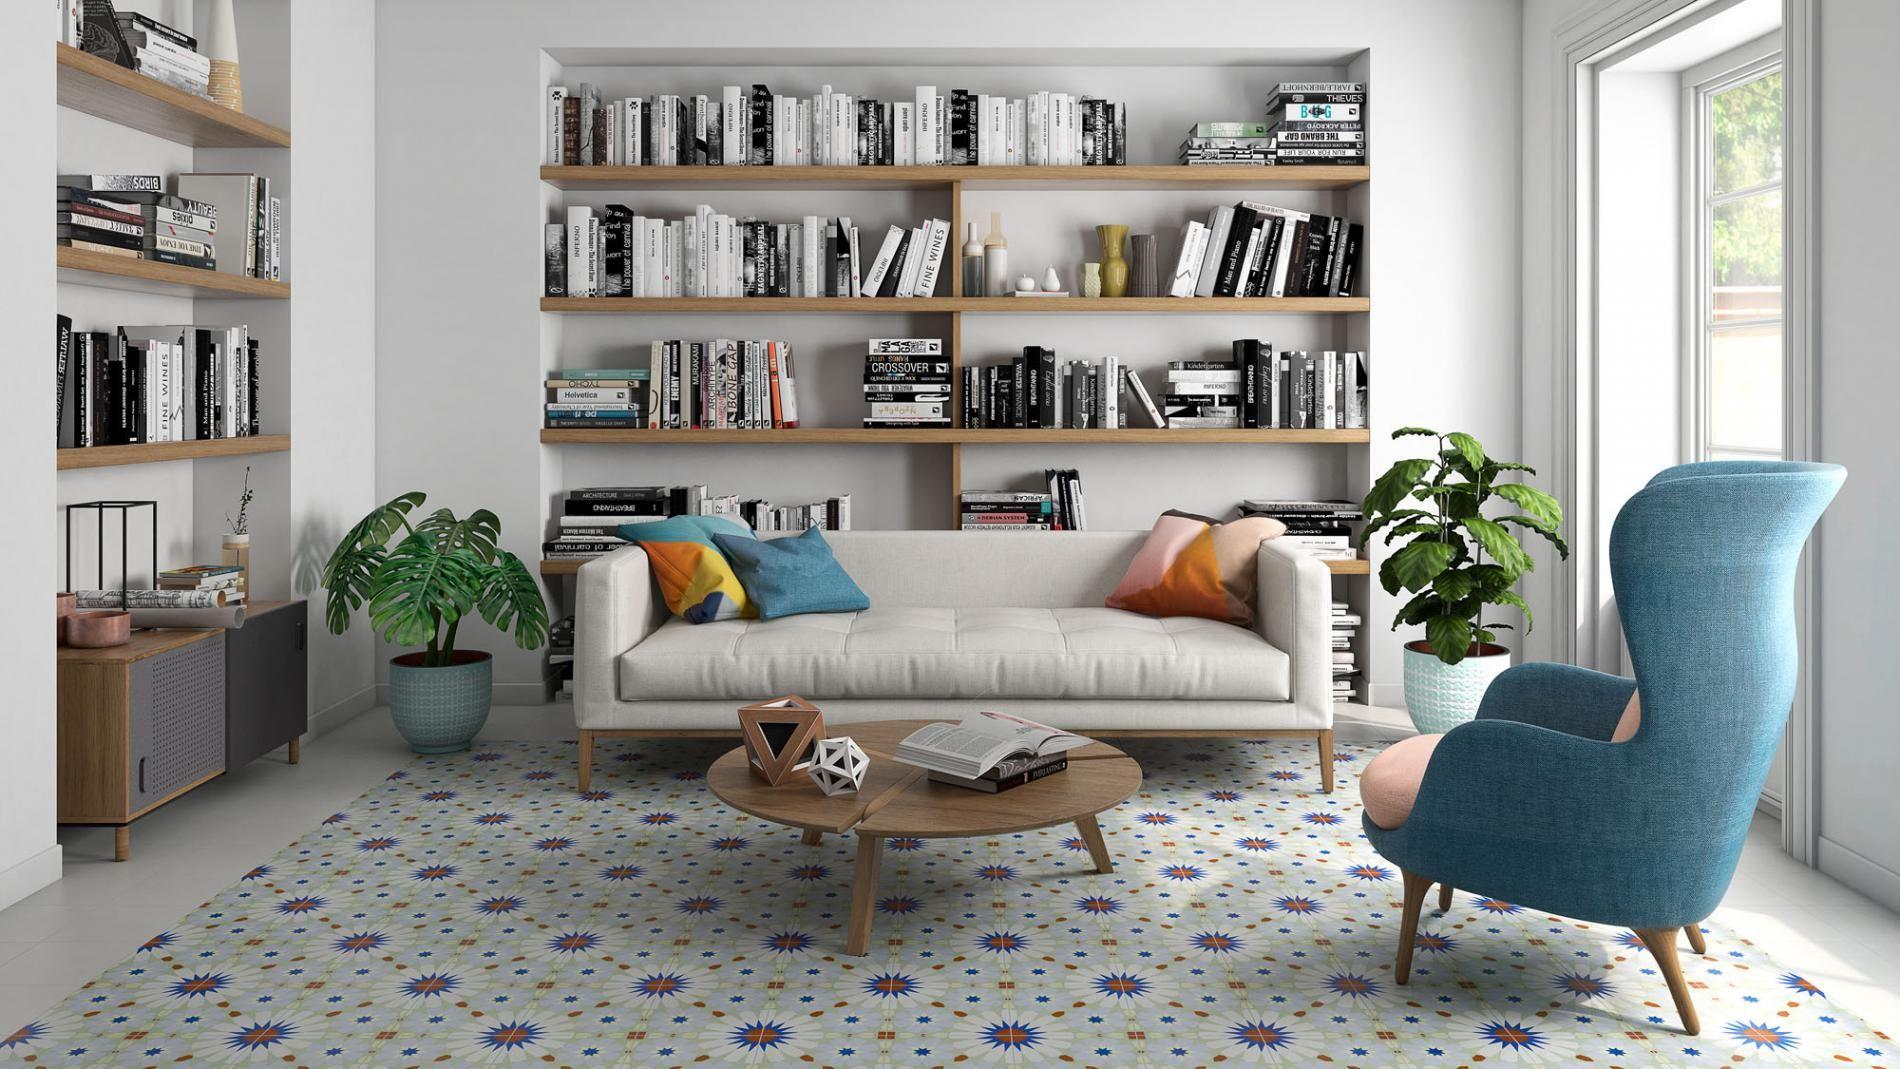 Best Cassat 9X9 With Images Room Home Interior Design 400 x 300